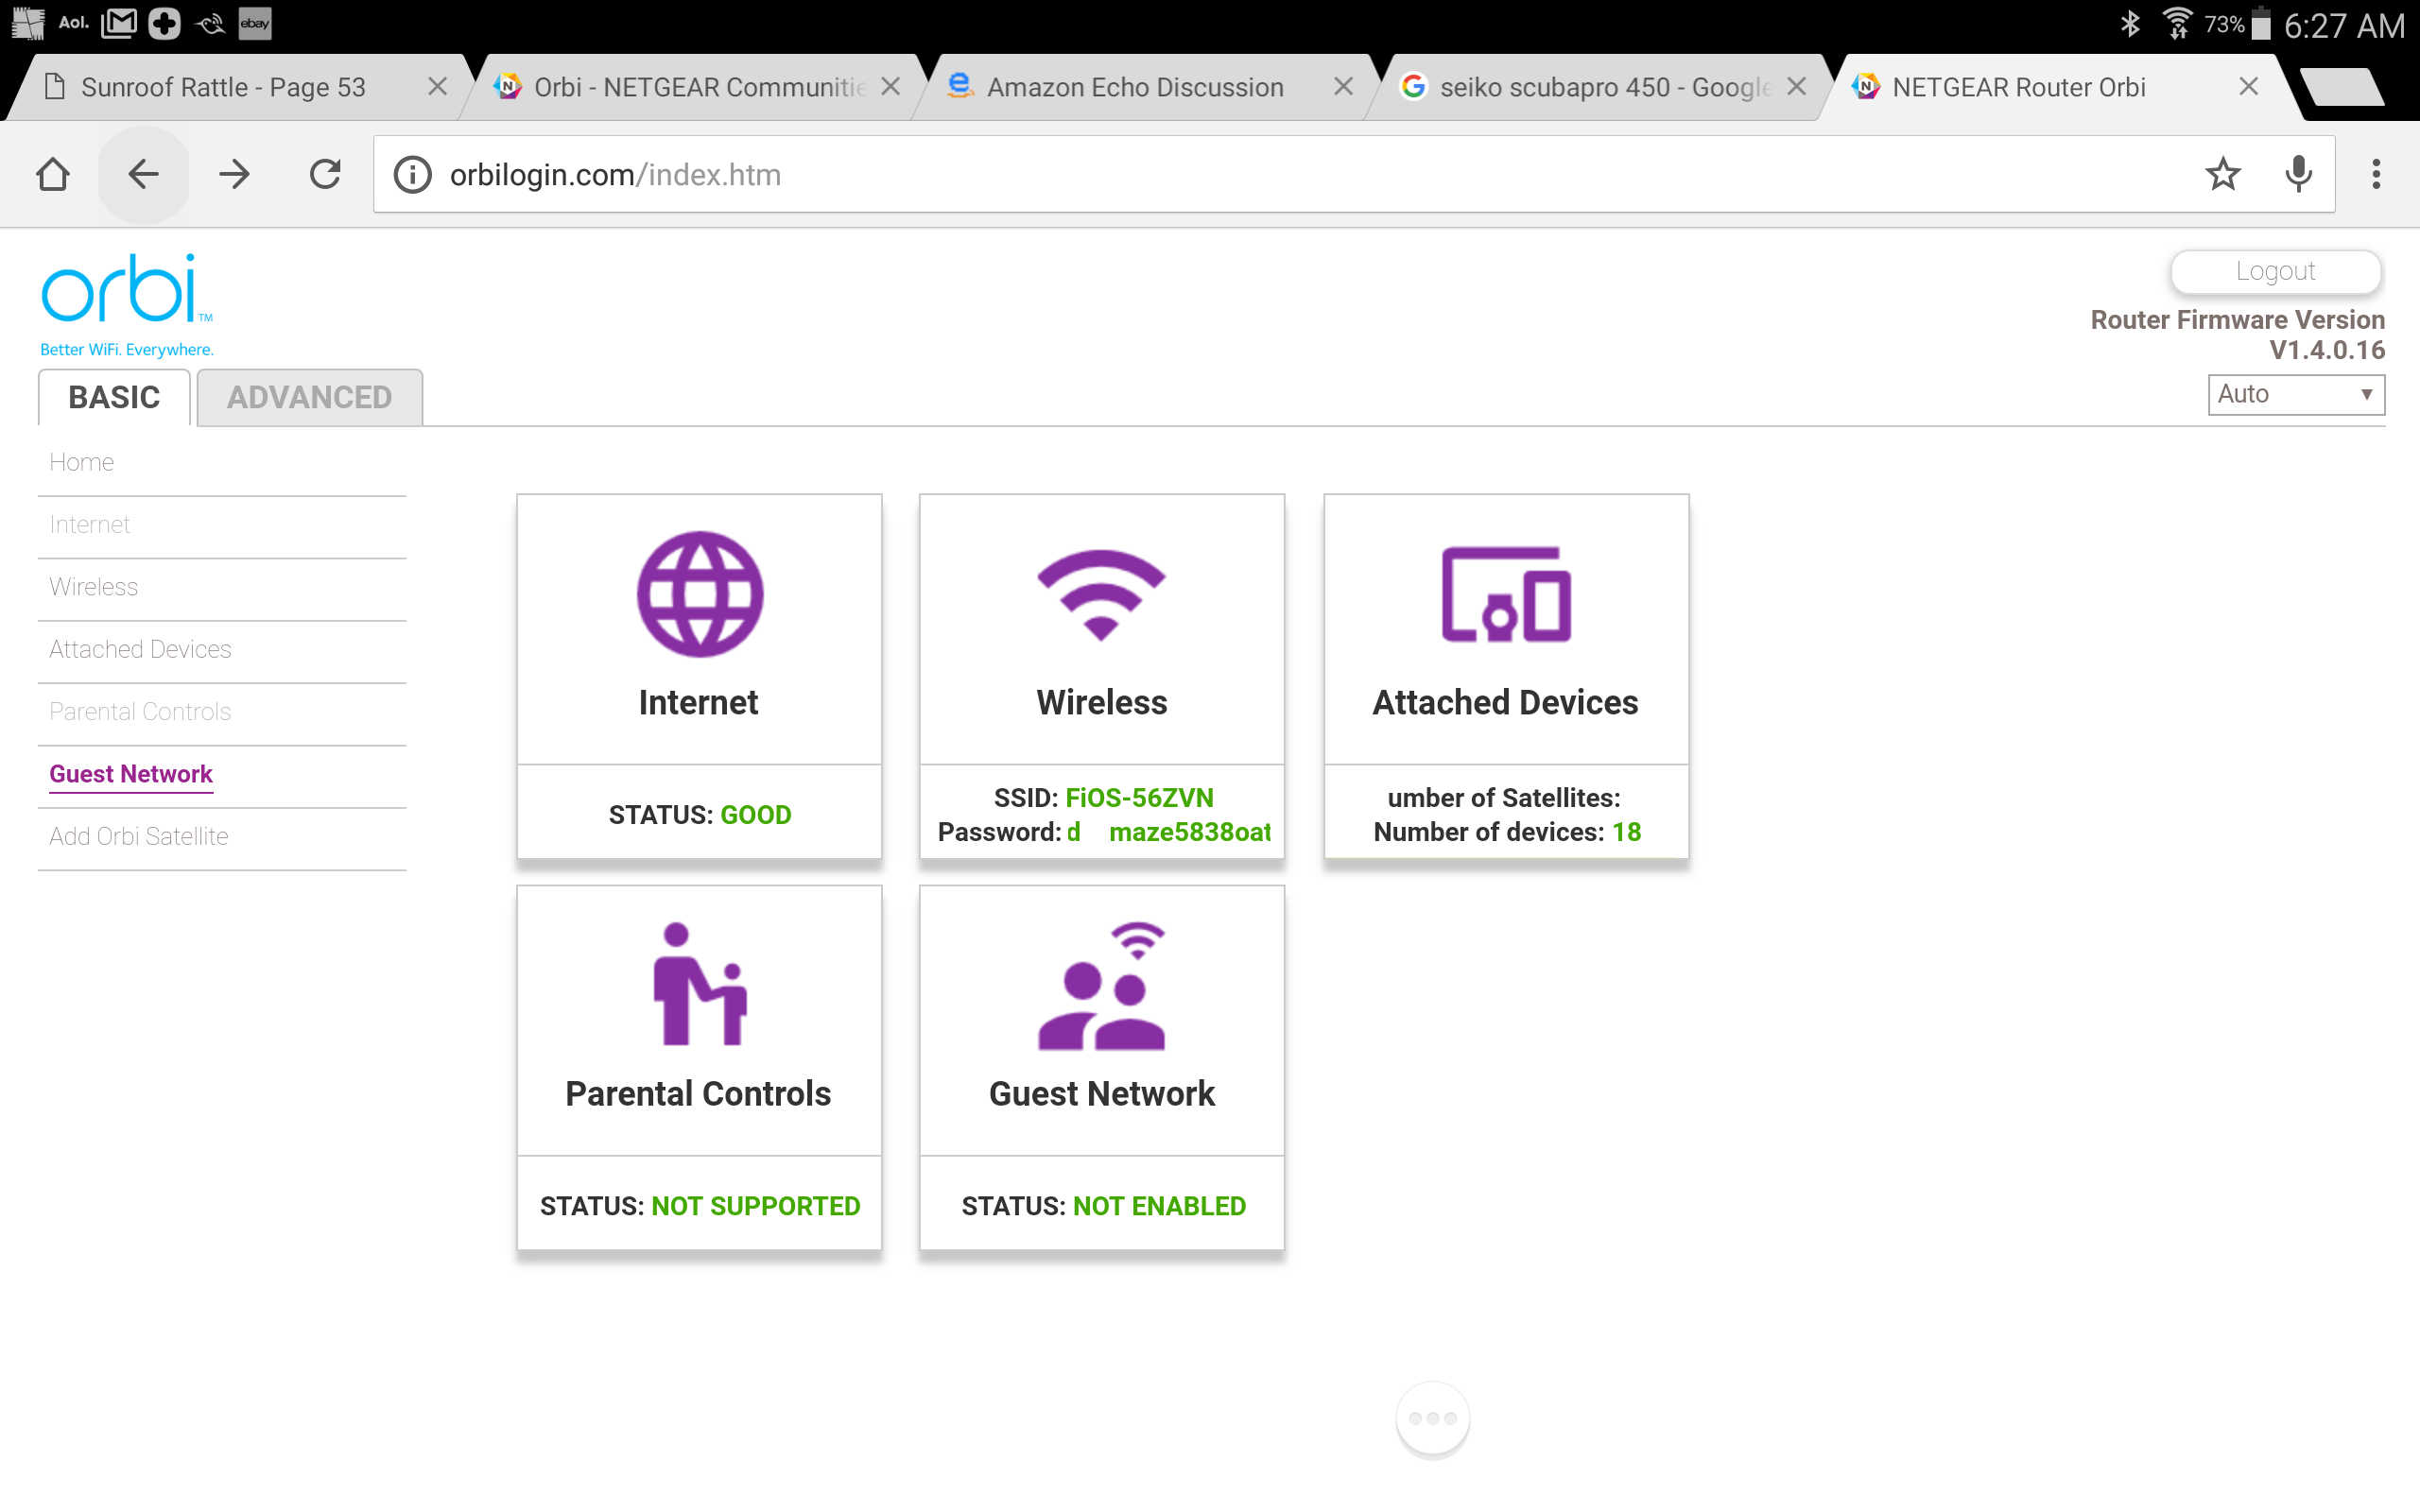 R6020 wifi routers networking home netgear - R6020 Wifi Routers Networking Home Netgear 44